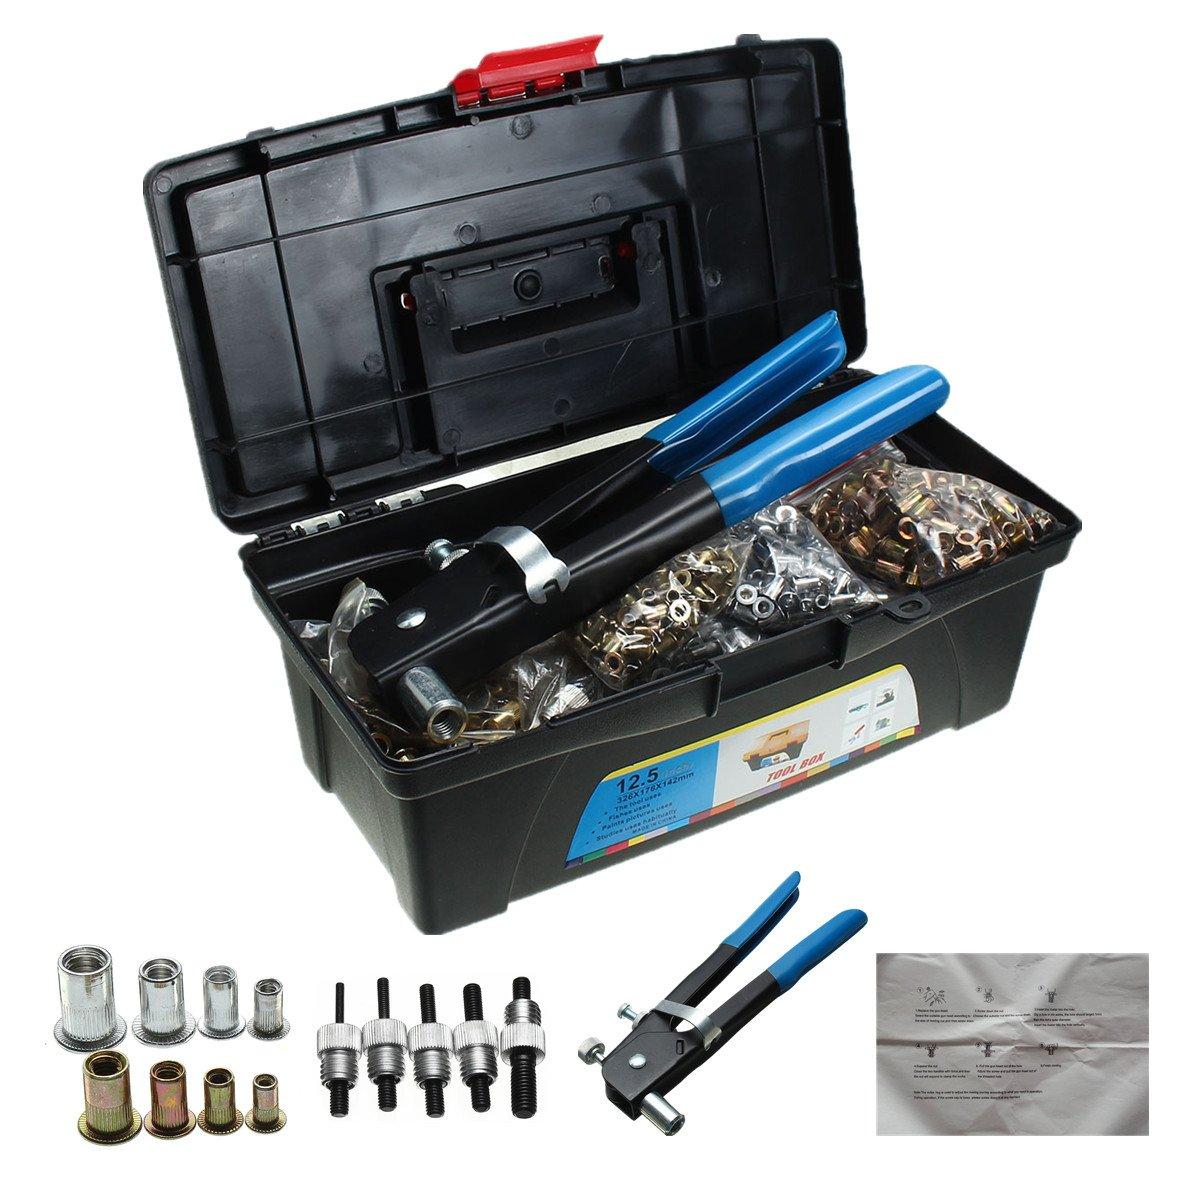 HITSAN 1600Pcs M3 M4 M5 M6 M8 Blind Rivet Nut Rivnut Nutsert Insert Tool Box Kit One Piece